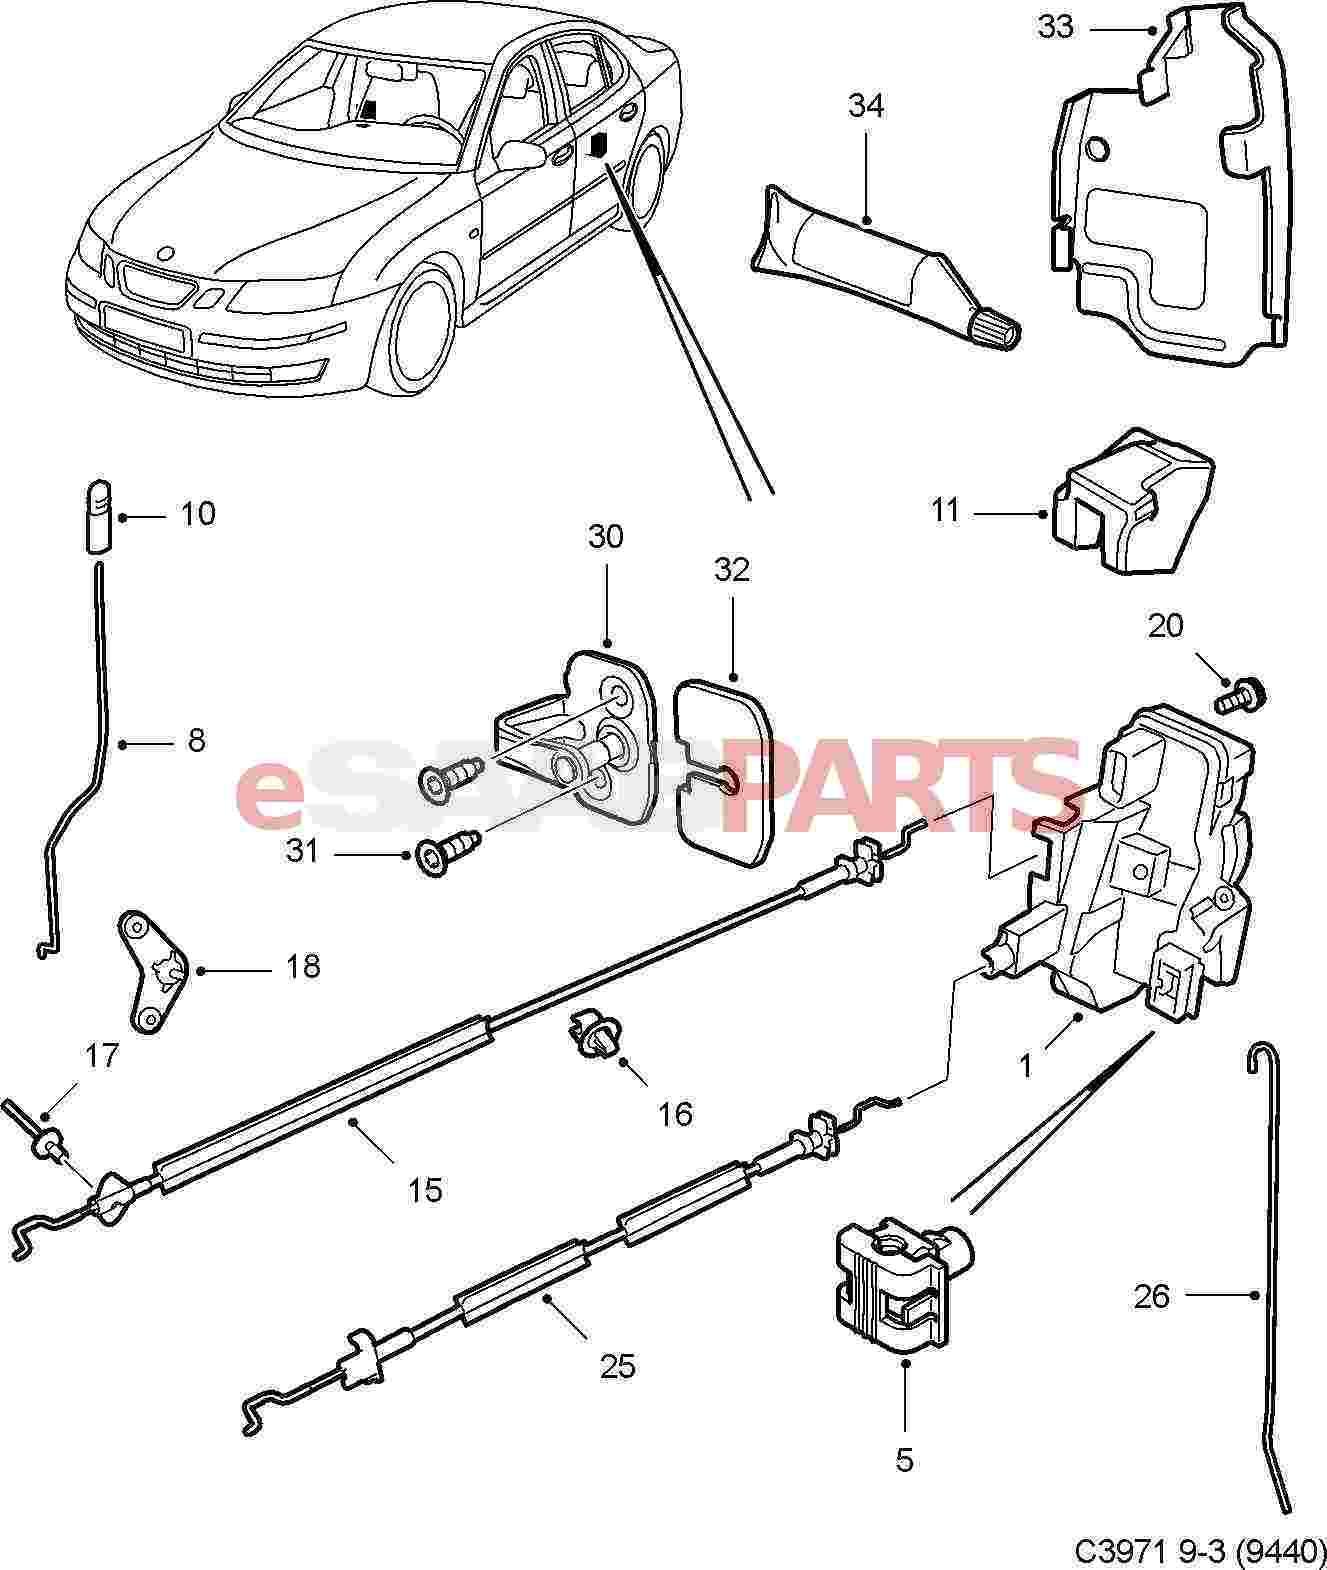 Saab 96 Model Body Parts